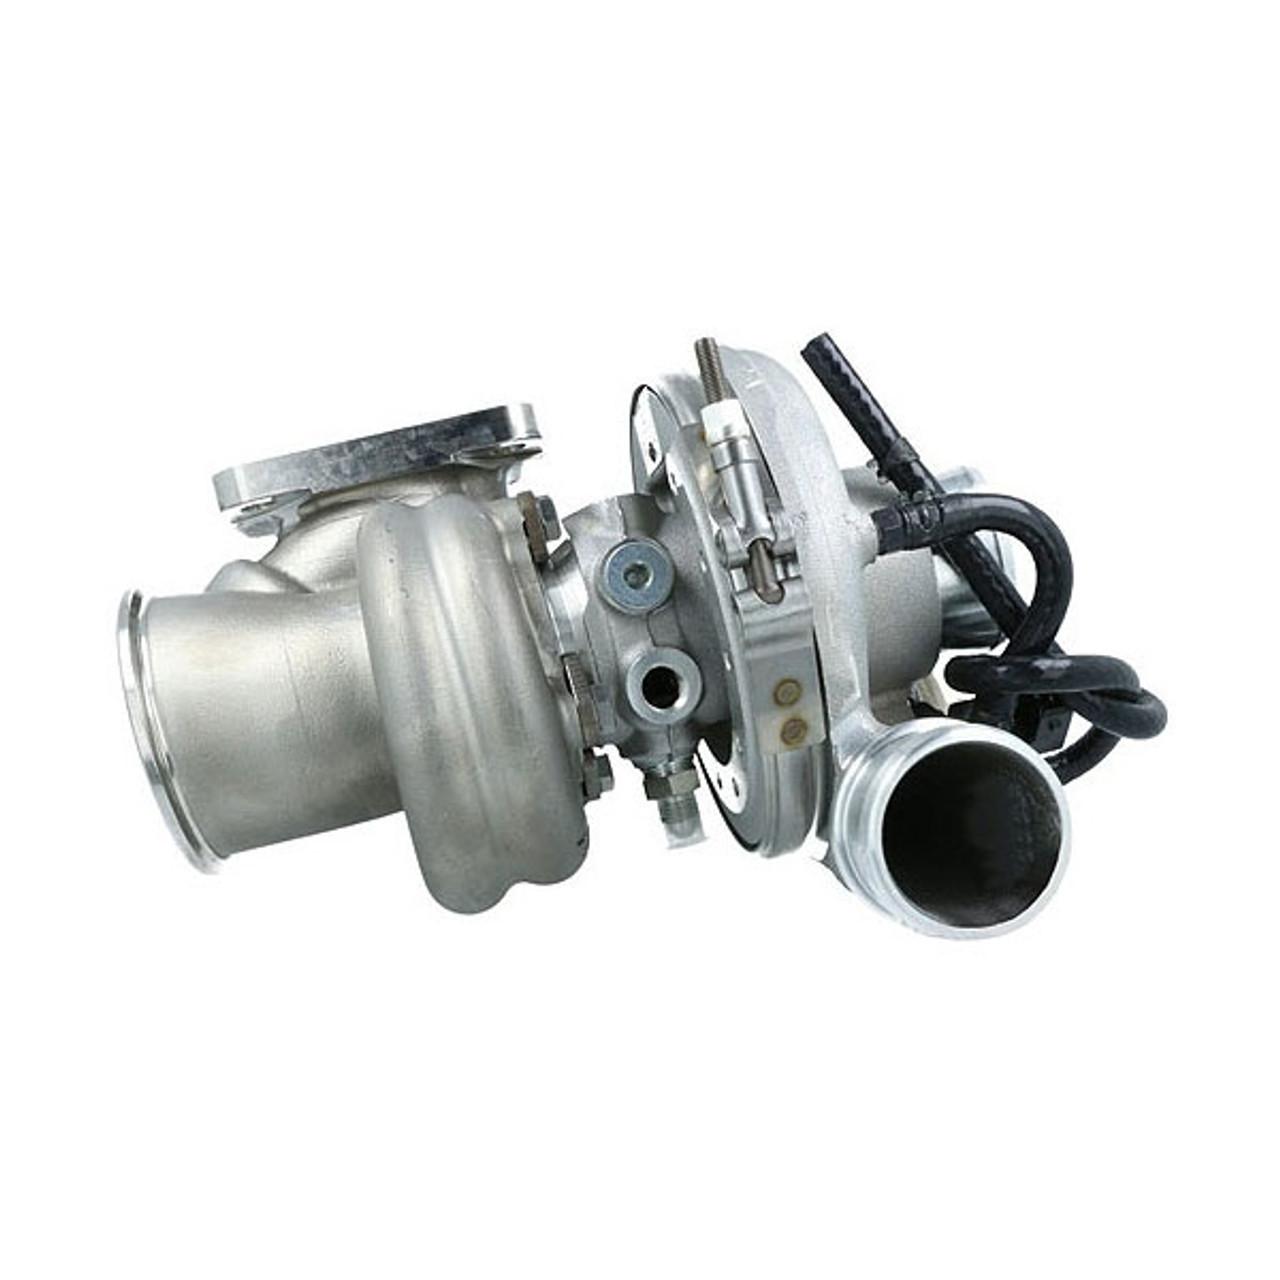 BORGWARNER (11639880002) EFR 7163-G TURBOCHARGER, B1 FRAME SIZE (550 HP)